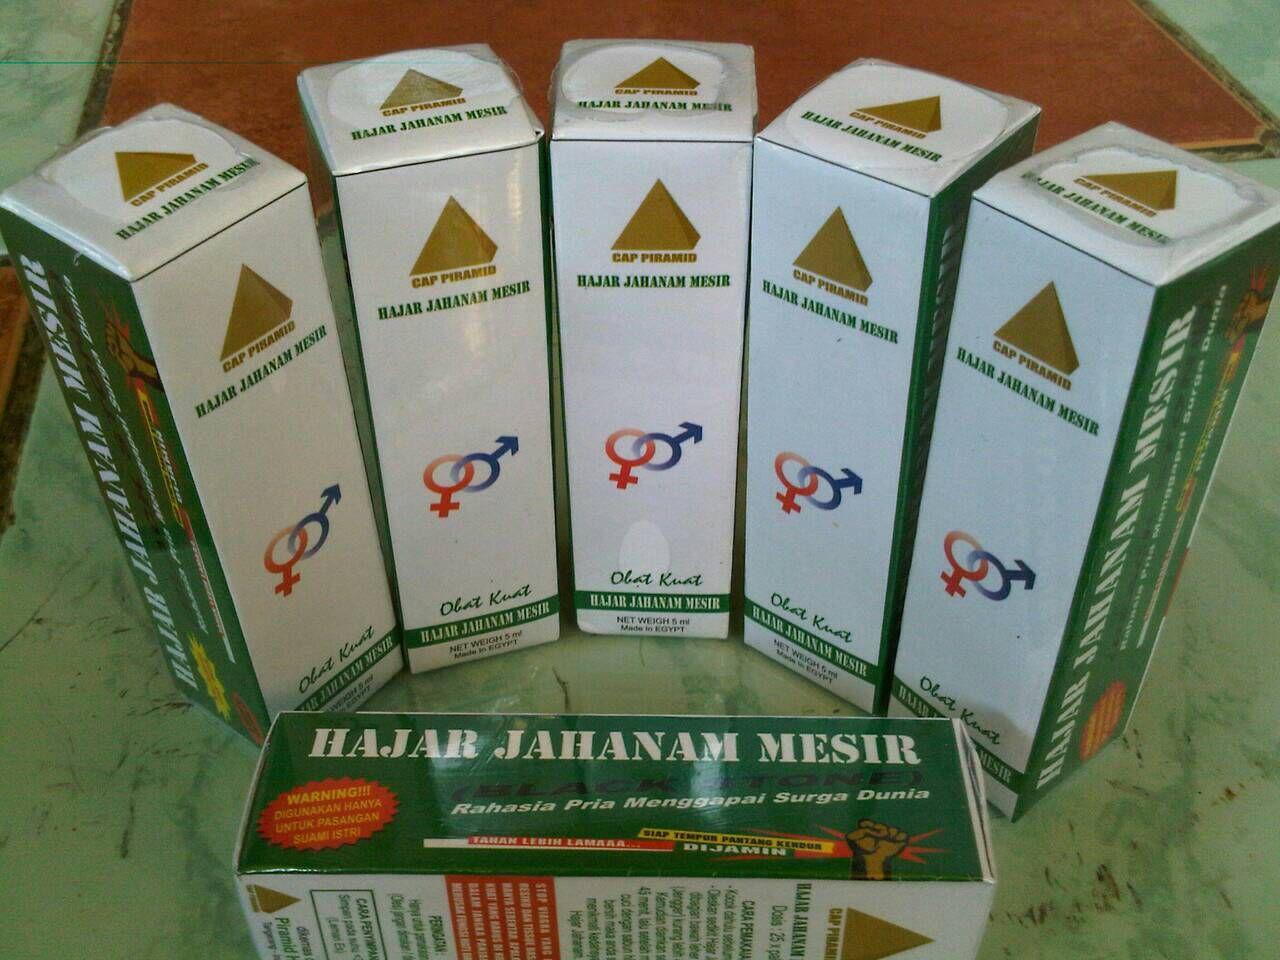 limited edition wa 62858 7610 1981 jamu kuat pria tradisional